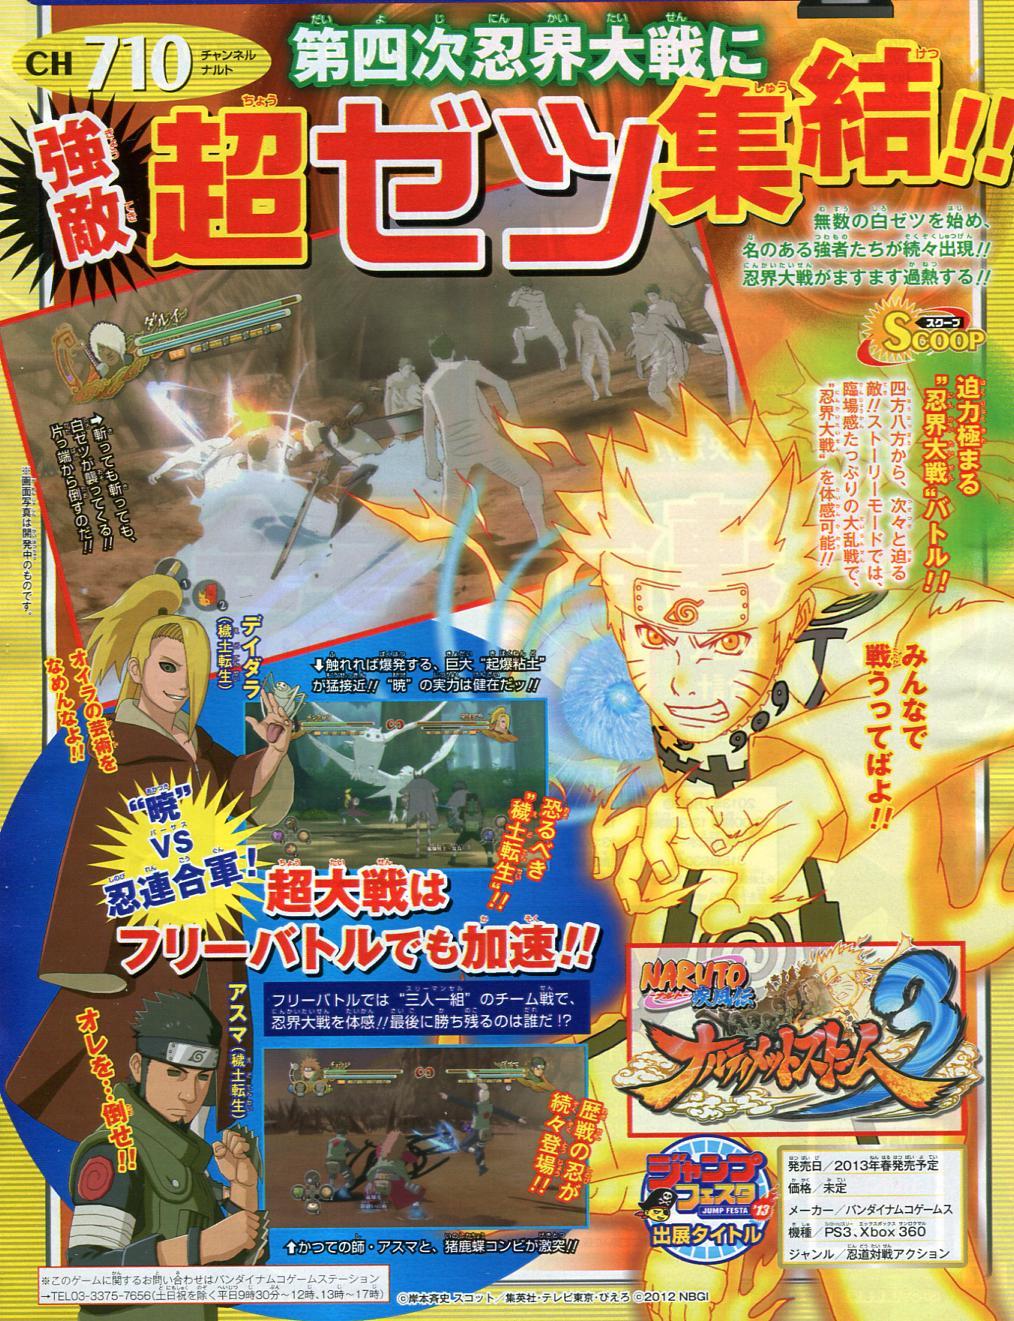 https://game-saga.com/wp-content/uploads/2018/12/naruto-shippuden-ultimate-ninja-storm-3-scan-1.jpg